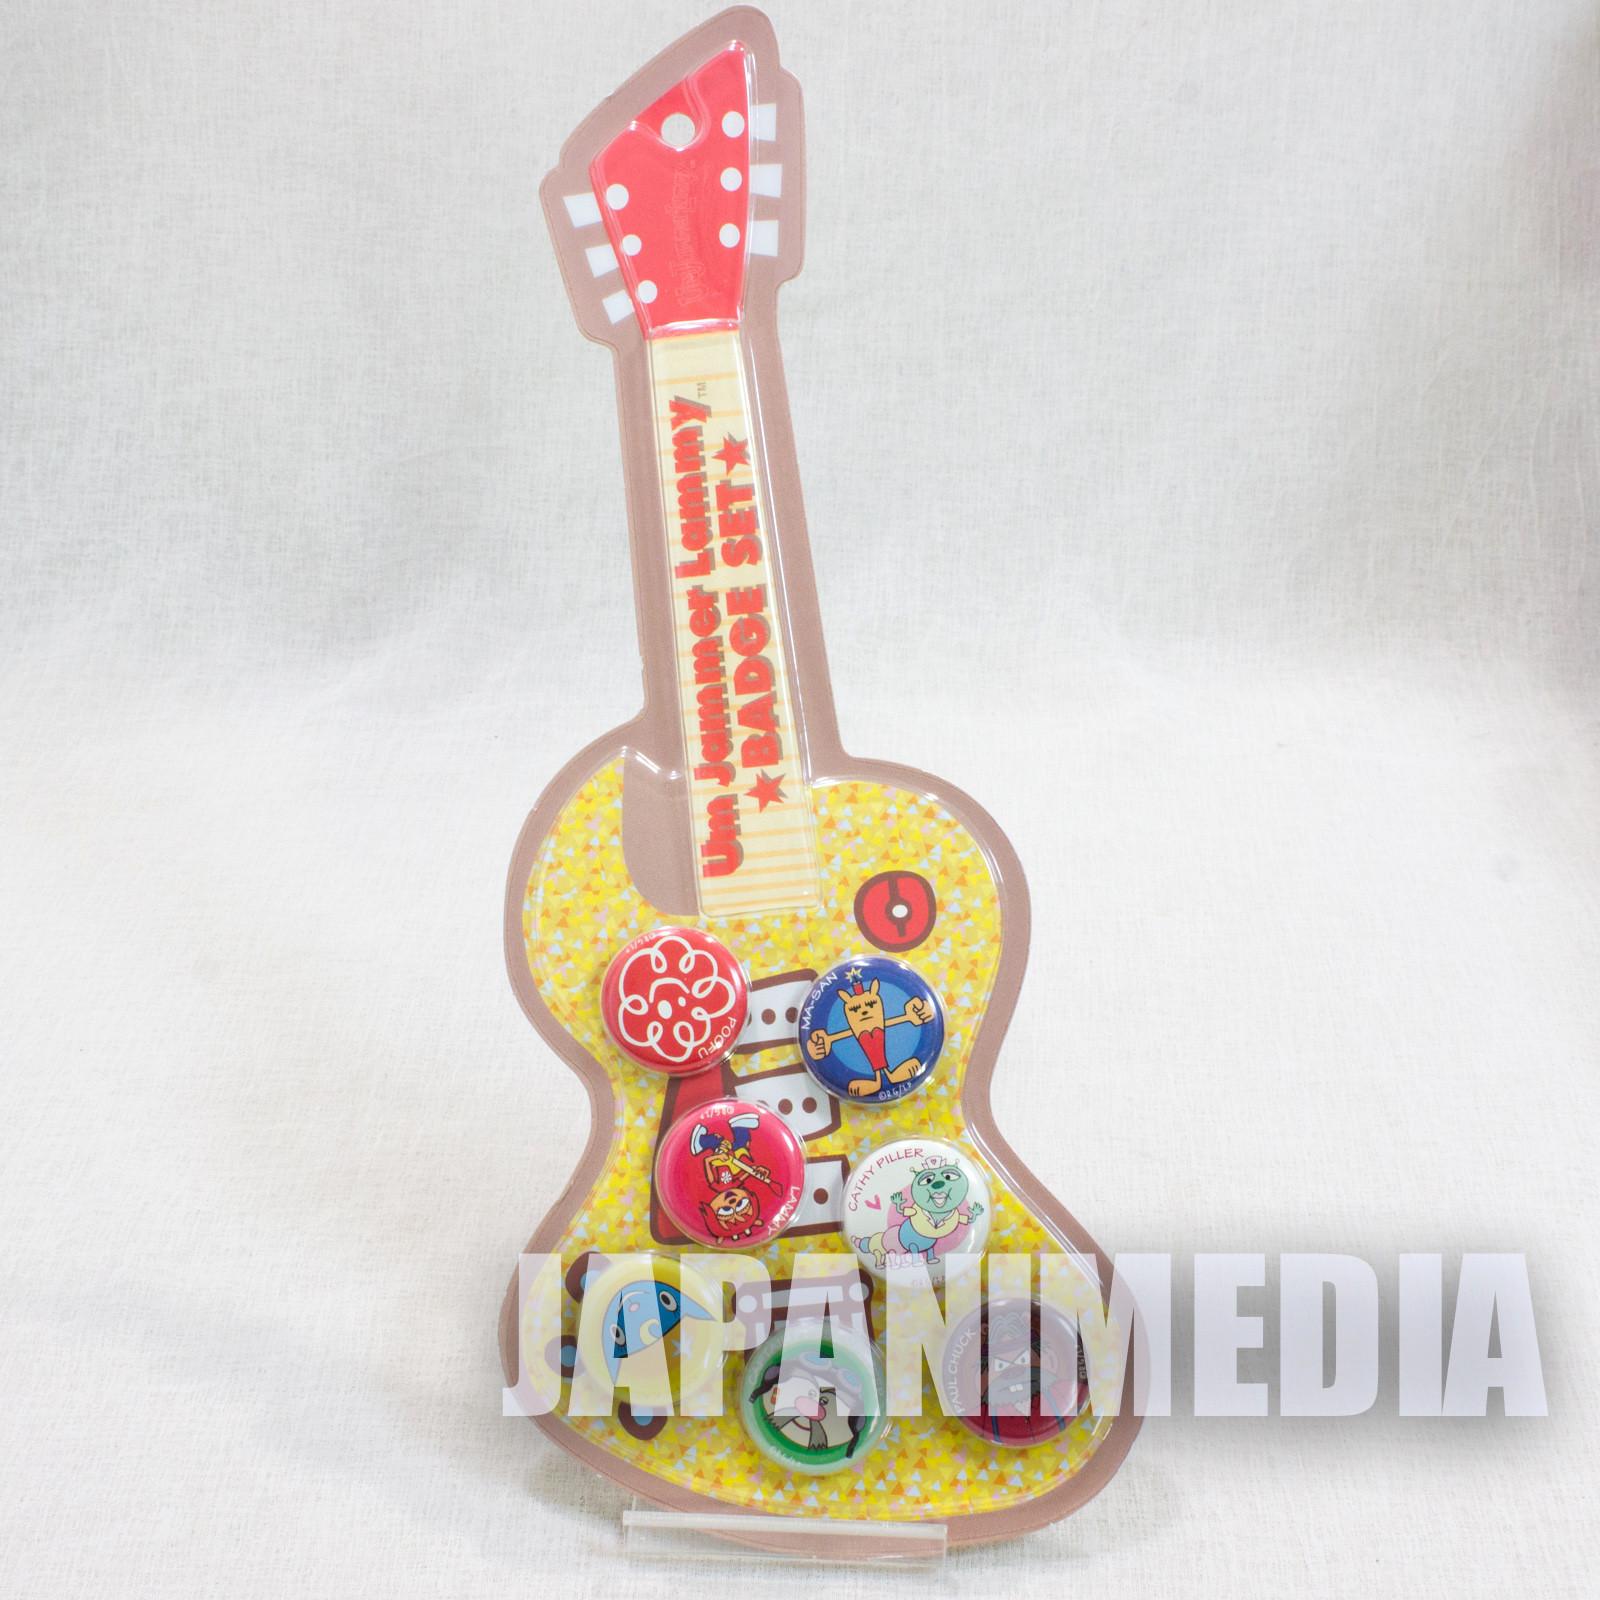 UmJammer Lammy Button badge 7pc set JAPAN ANIME GAME